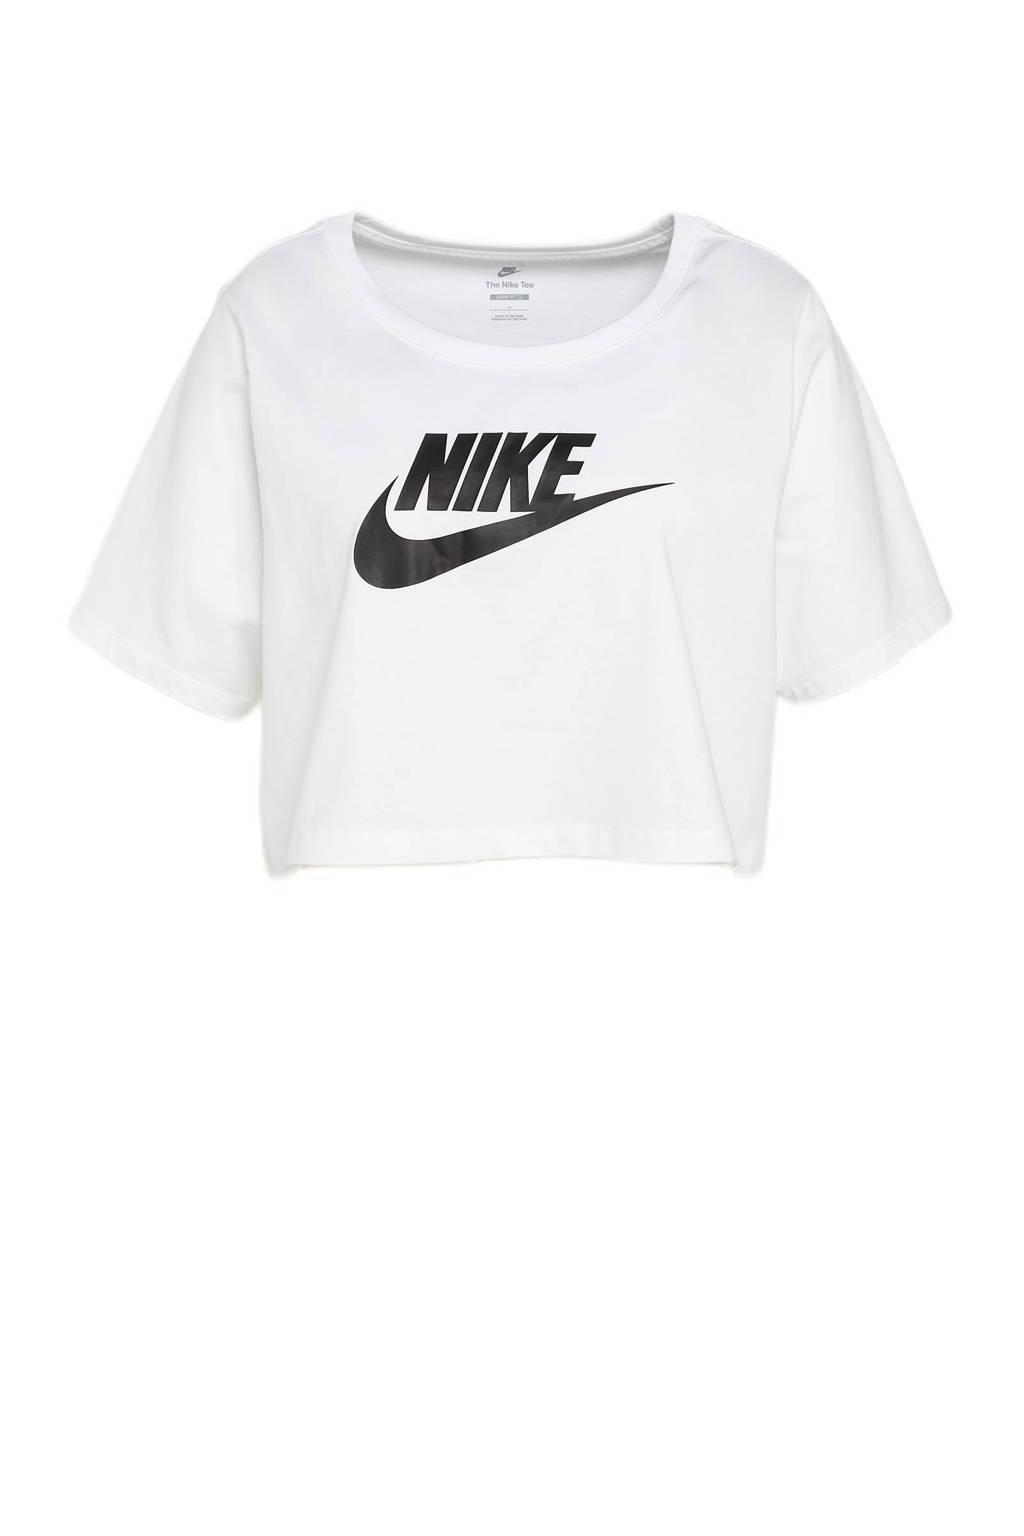 Nike Plus Size cropped T-shirt wit/zwart, Wit/zwart